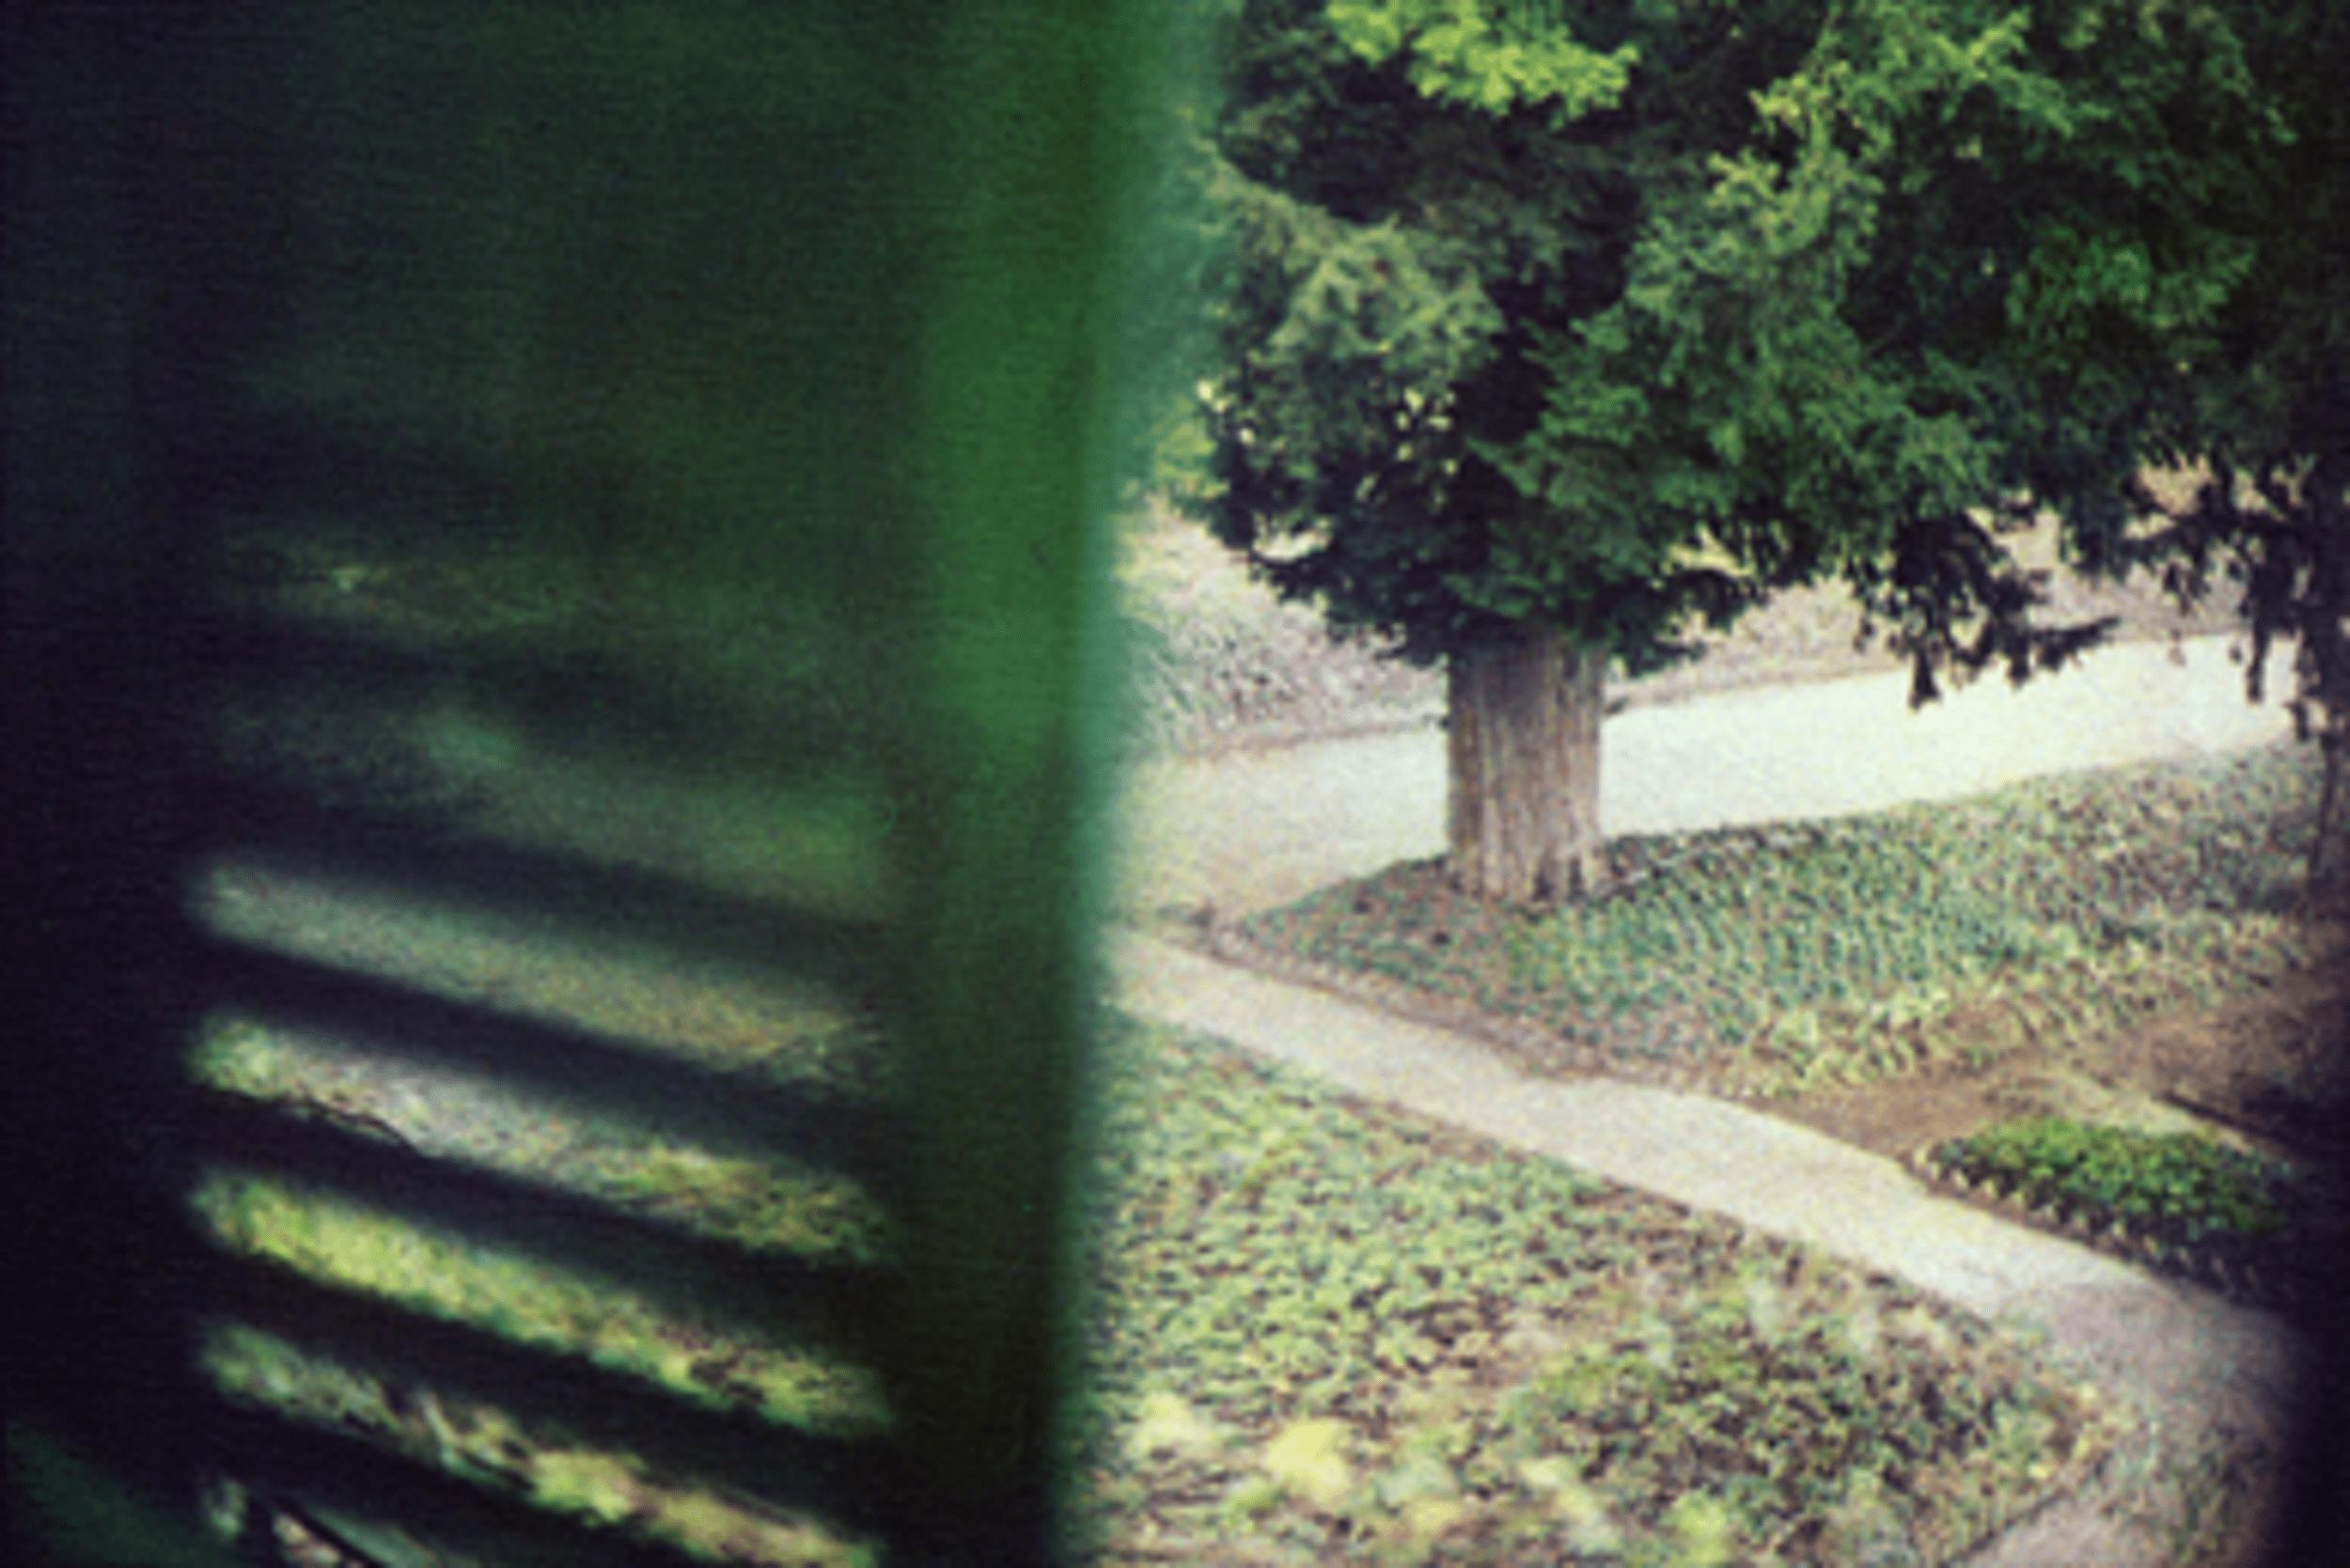 Bernard Plossu, Jardin vu de la chambre de Claude Monet, Giverny